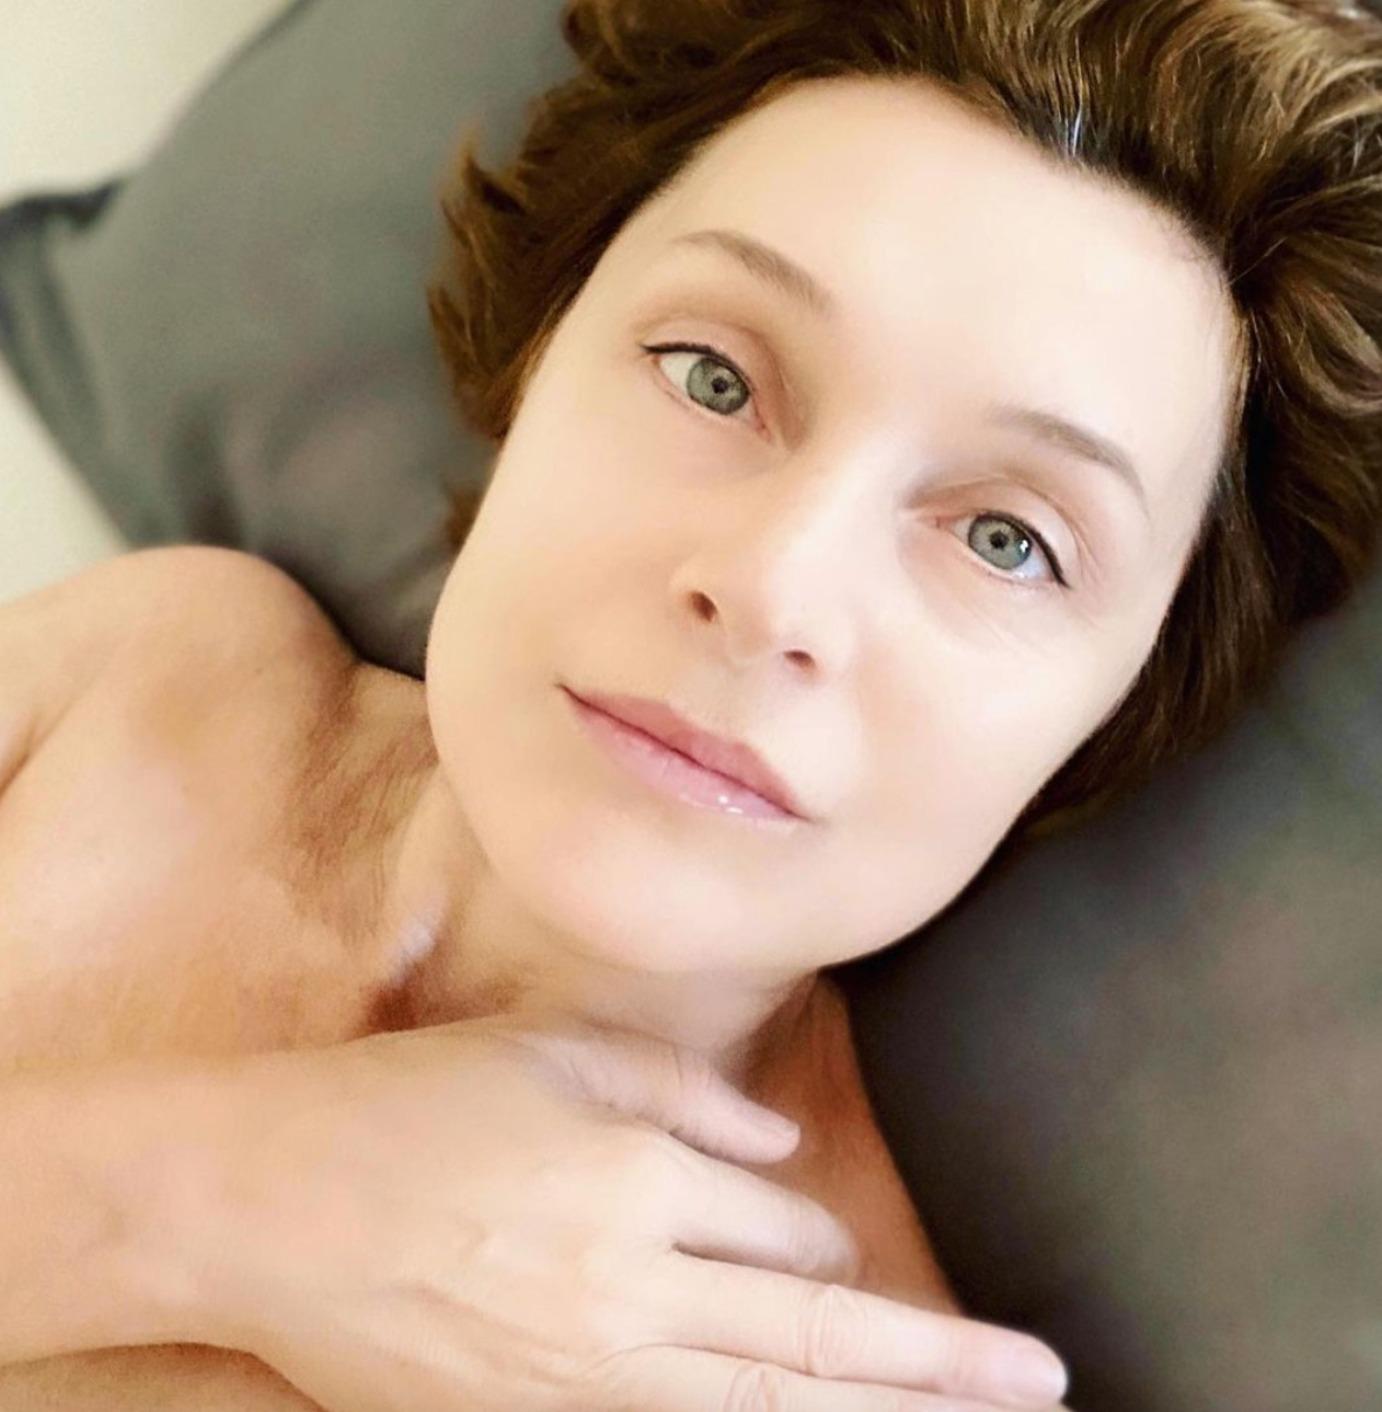 sabrina paravicini cancro intervento bikini